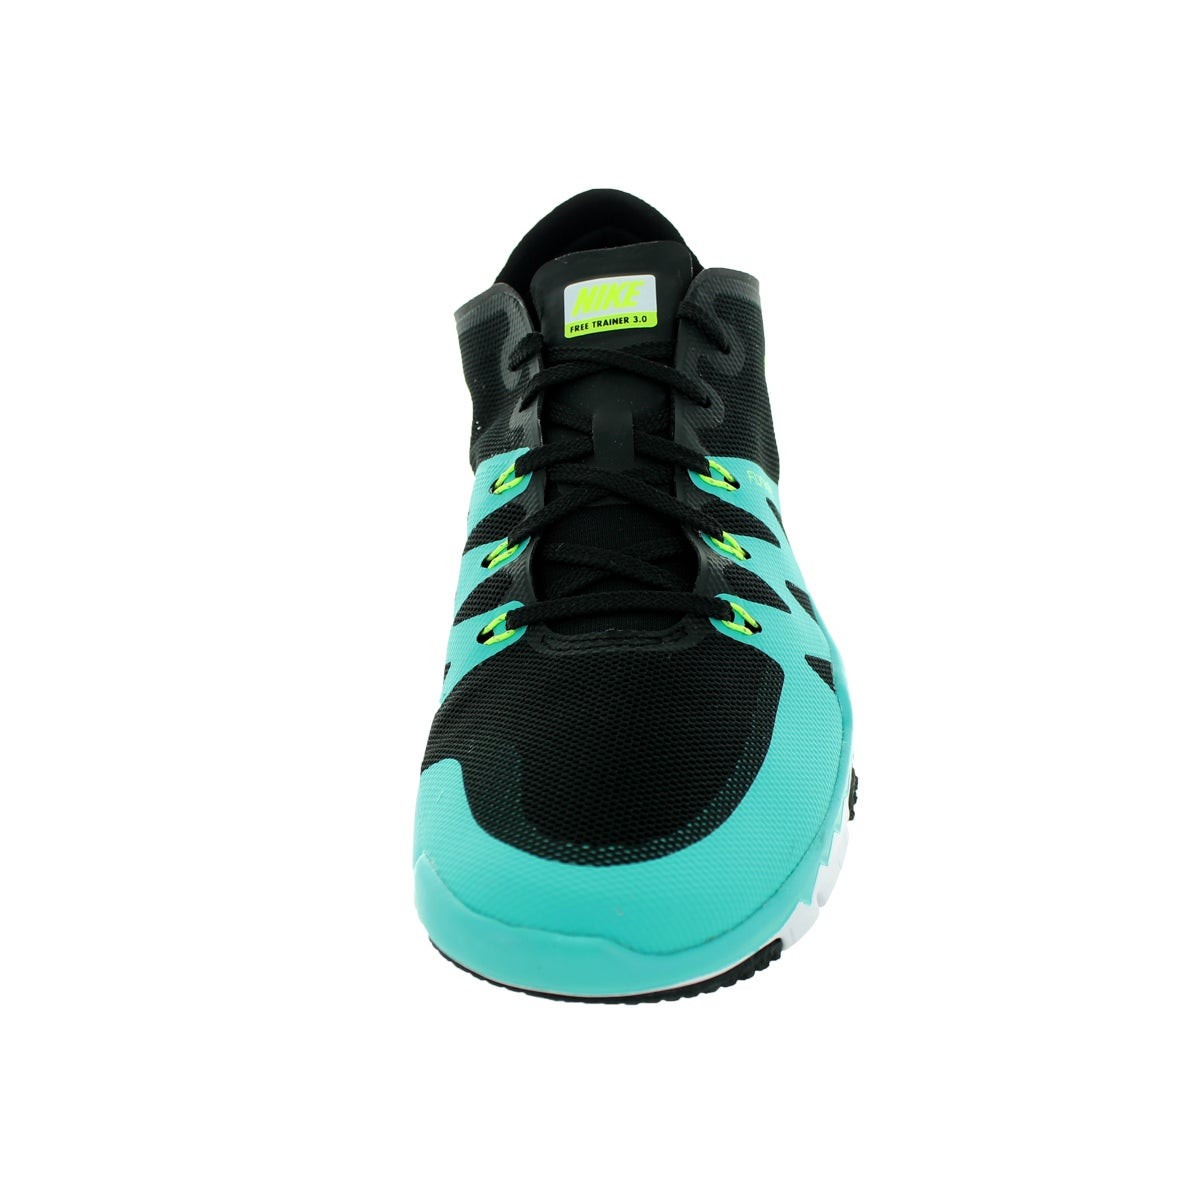 d0e4bec50fe7f Shop Nike Men s Free Trainer 3.0 V3 Black Volt Lt Retro White Training Shoe  - Free Shipping Today - Overstock.com - 12329199